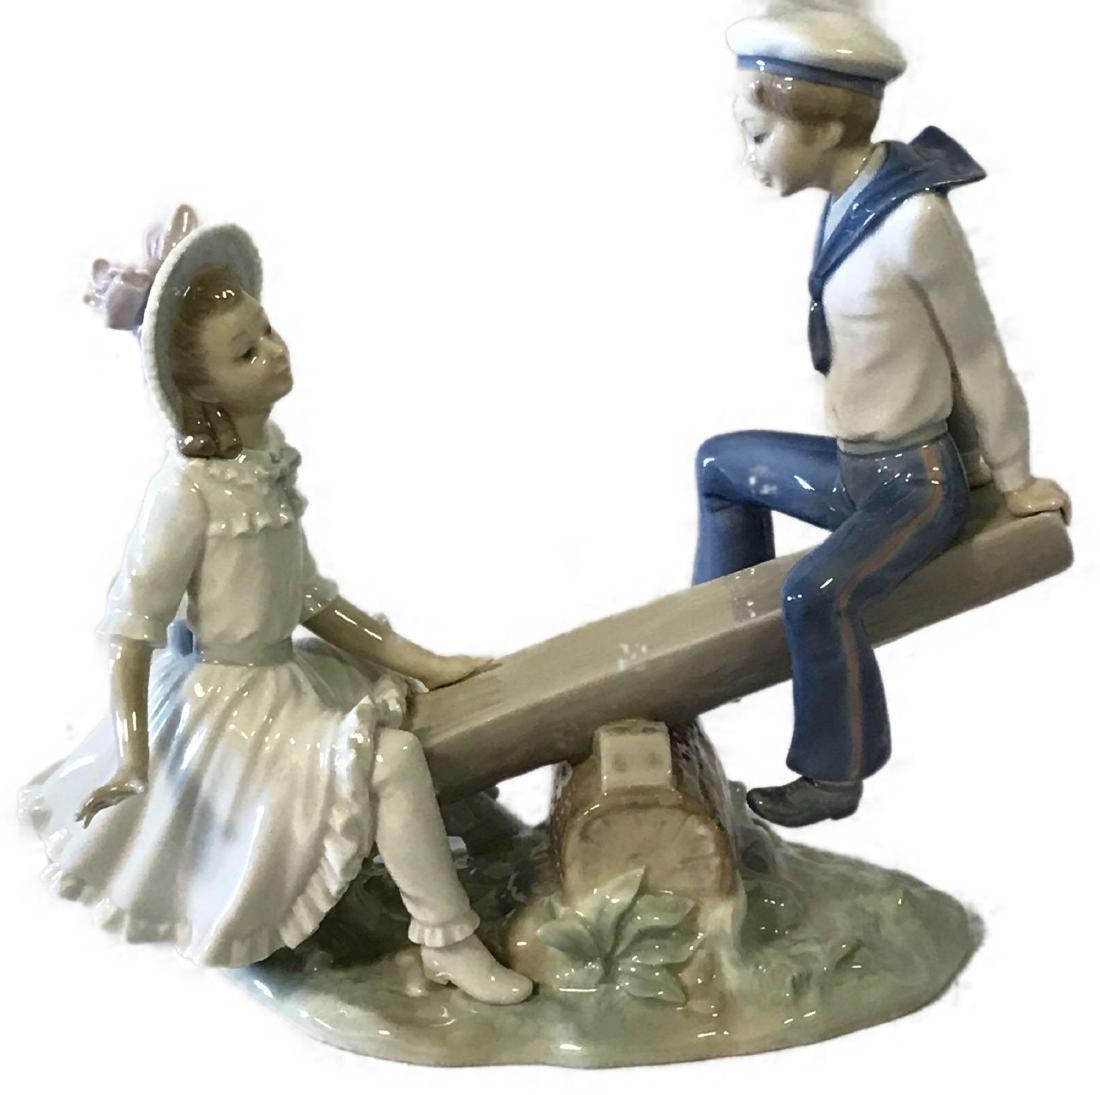 Lladro See-Saw Figurine